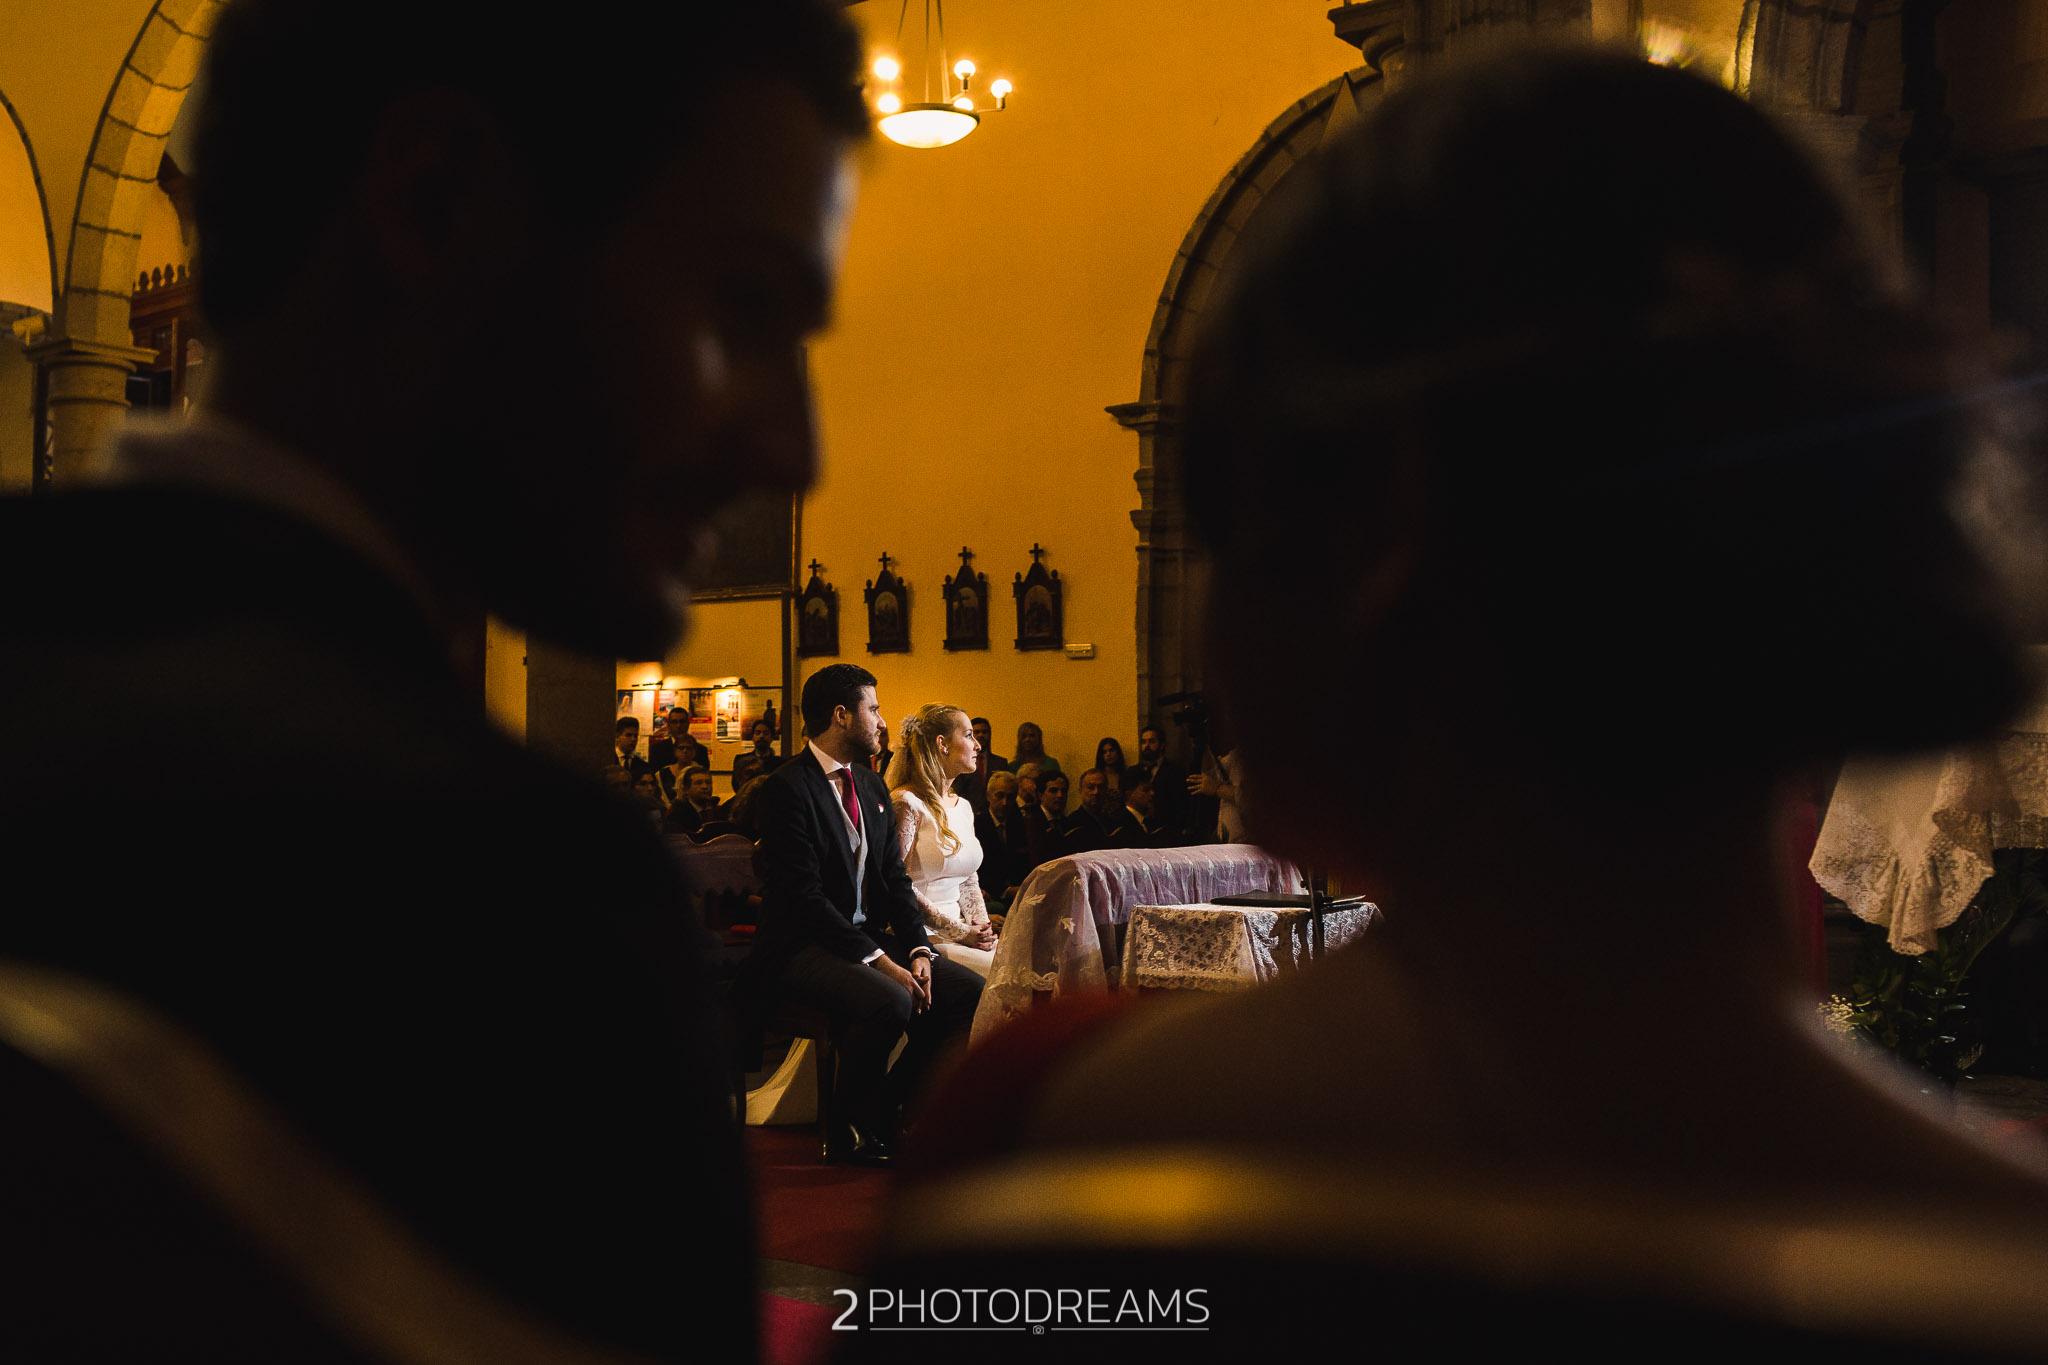 Wedding photographer Lincs Lincolnshire Yorkshire England